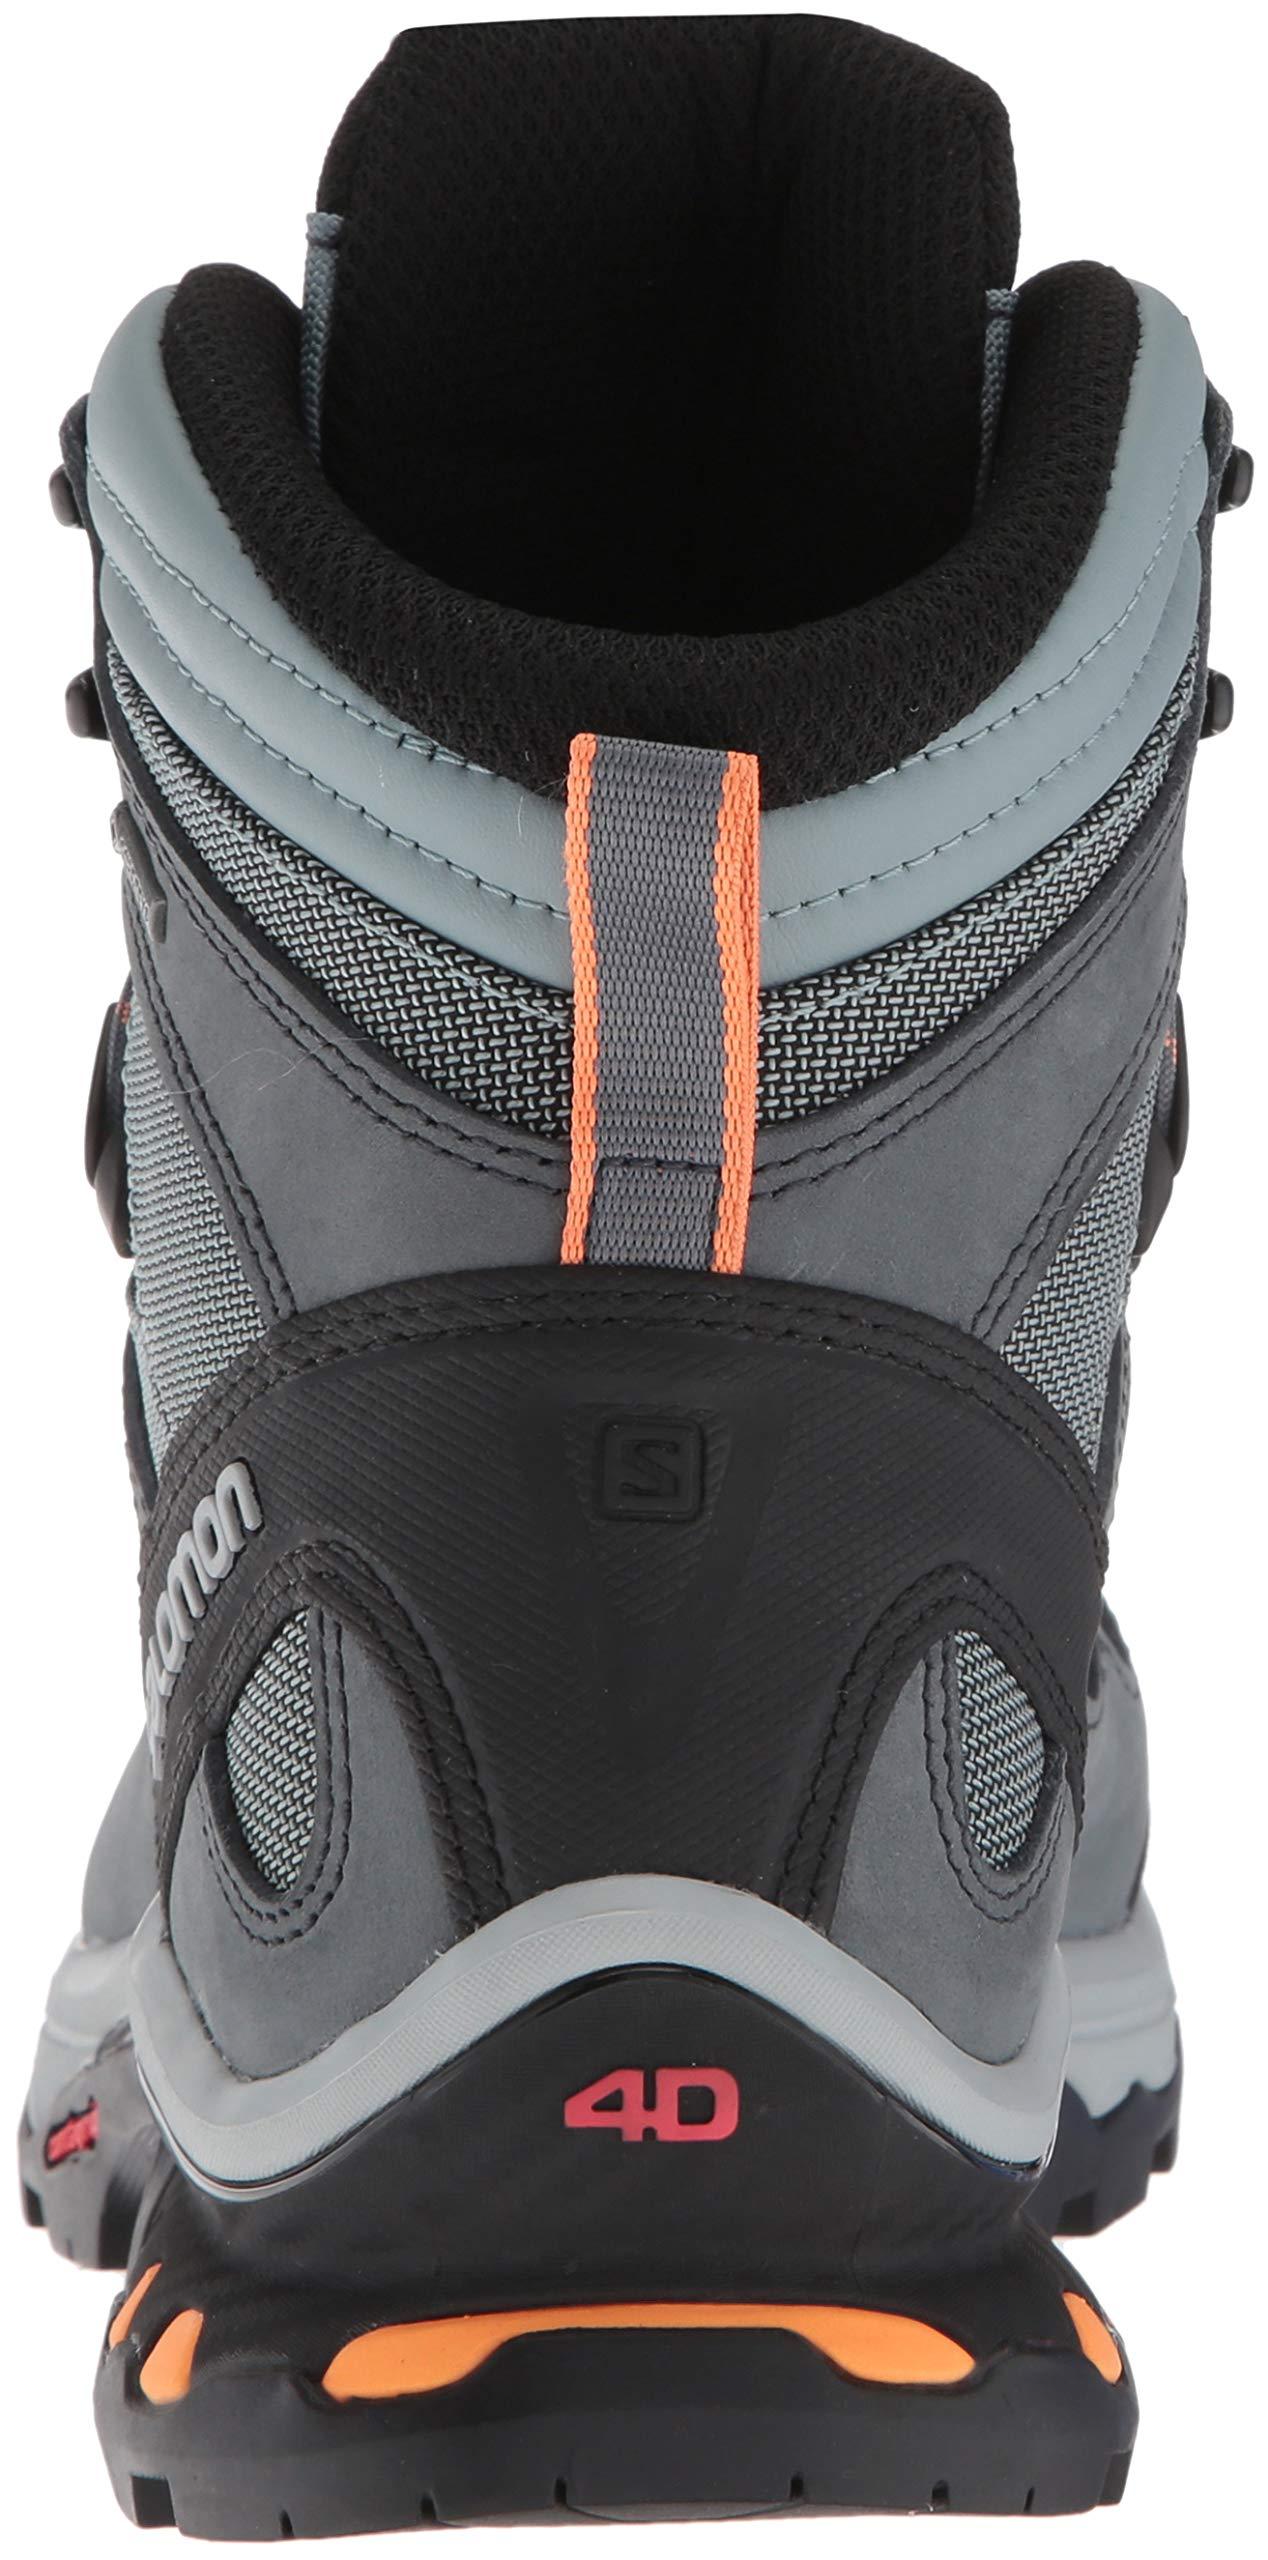 SALOMON Women's Quest 4d 3 GTX W High Rise Hiking Boots 2